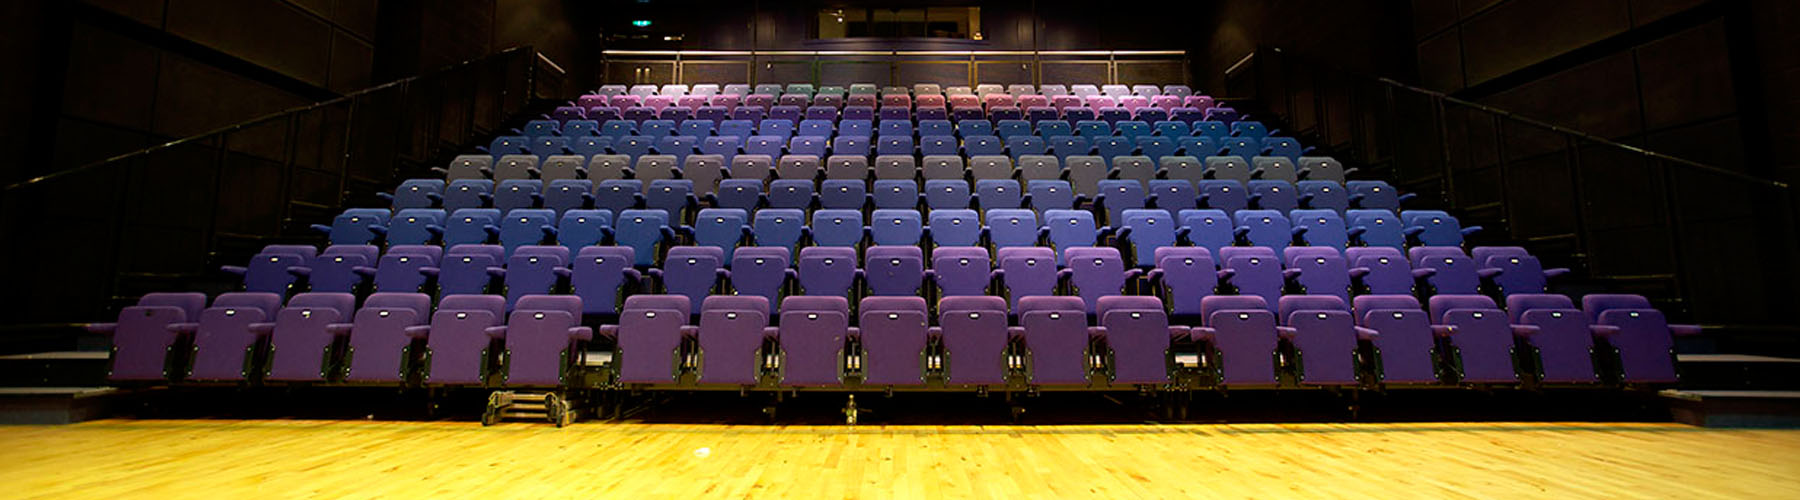 Hippodrome Theatre Birmingham Seating Plan Brokeasshome Com